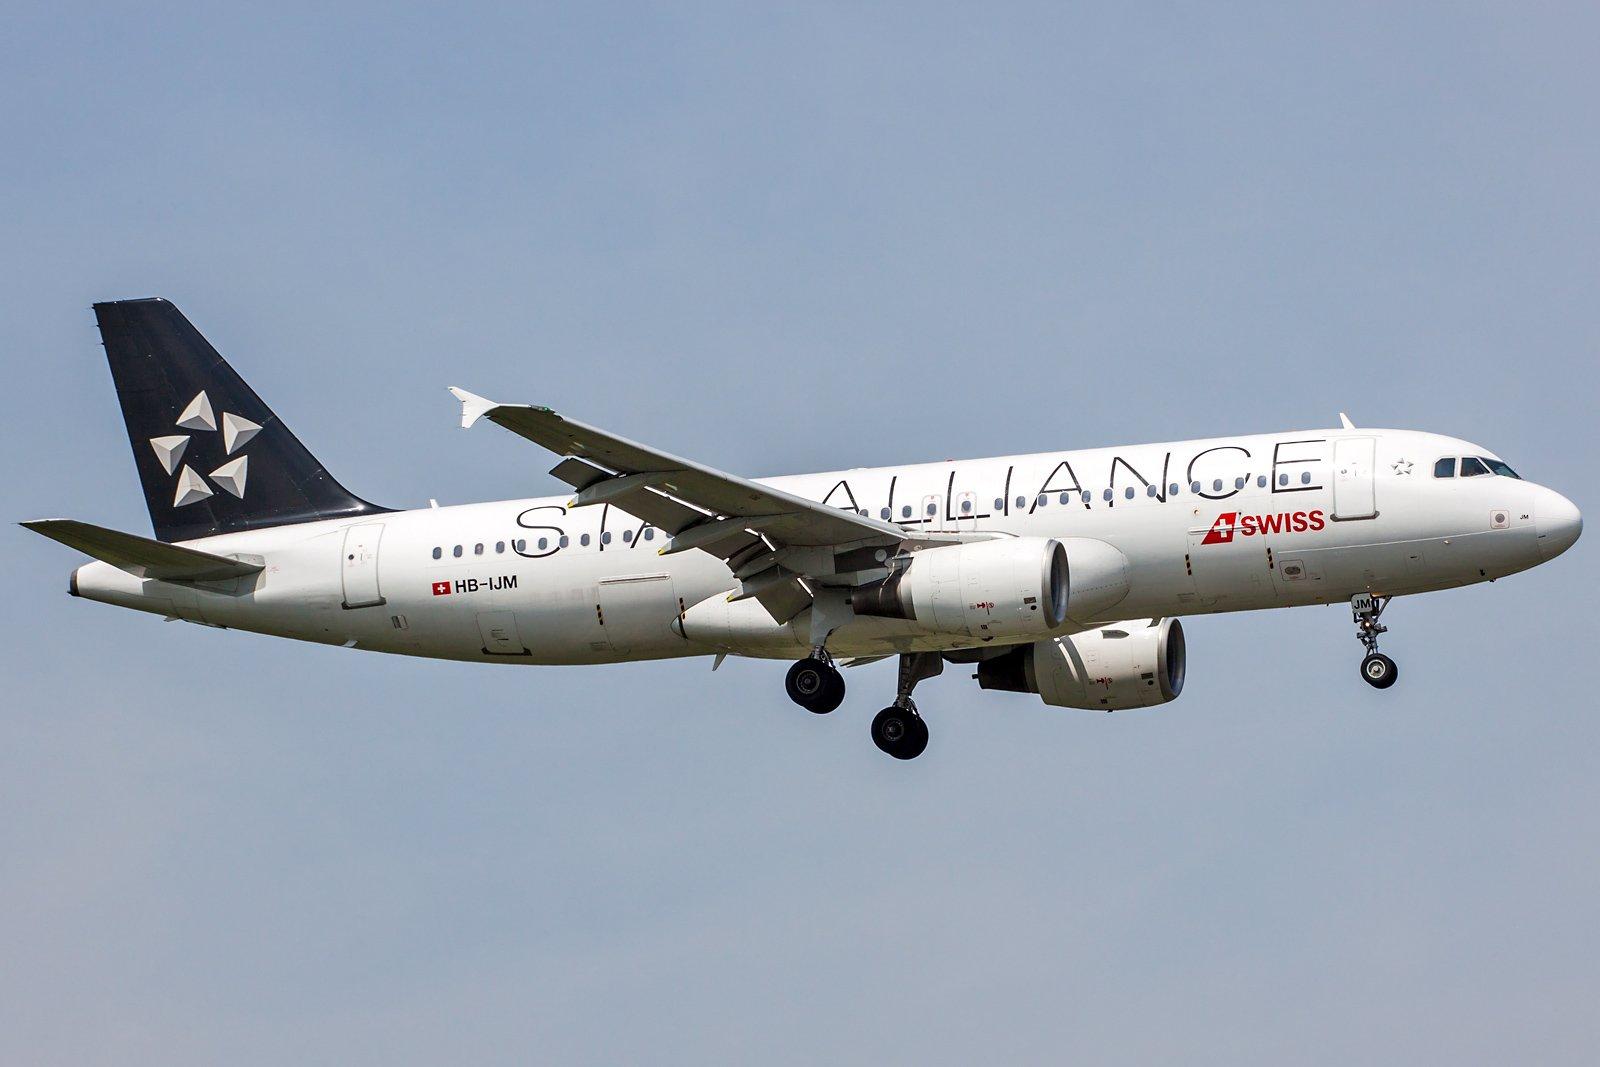 Swiss Airbus A320-214 HB-IJM